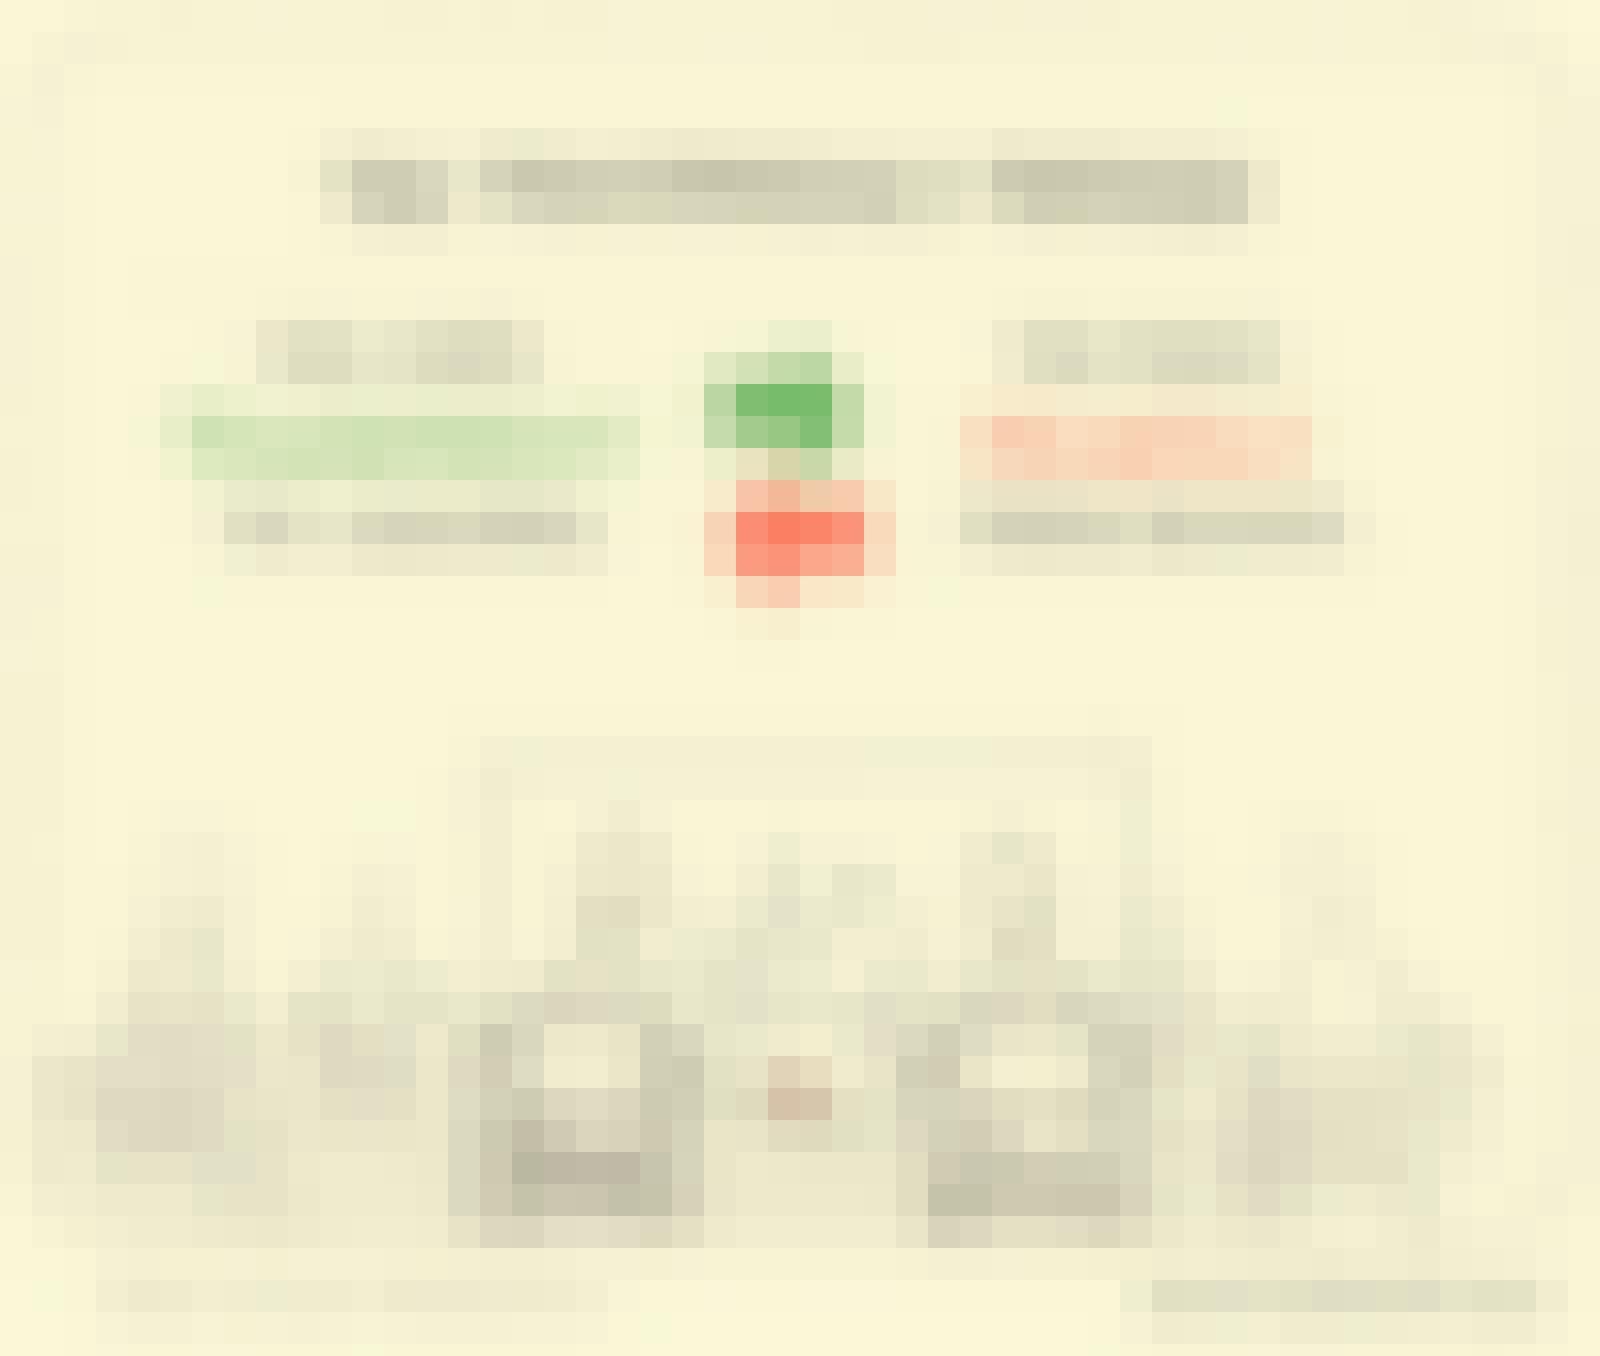 The transparency paradox - Sketchplanations